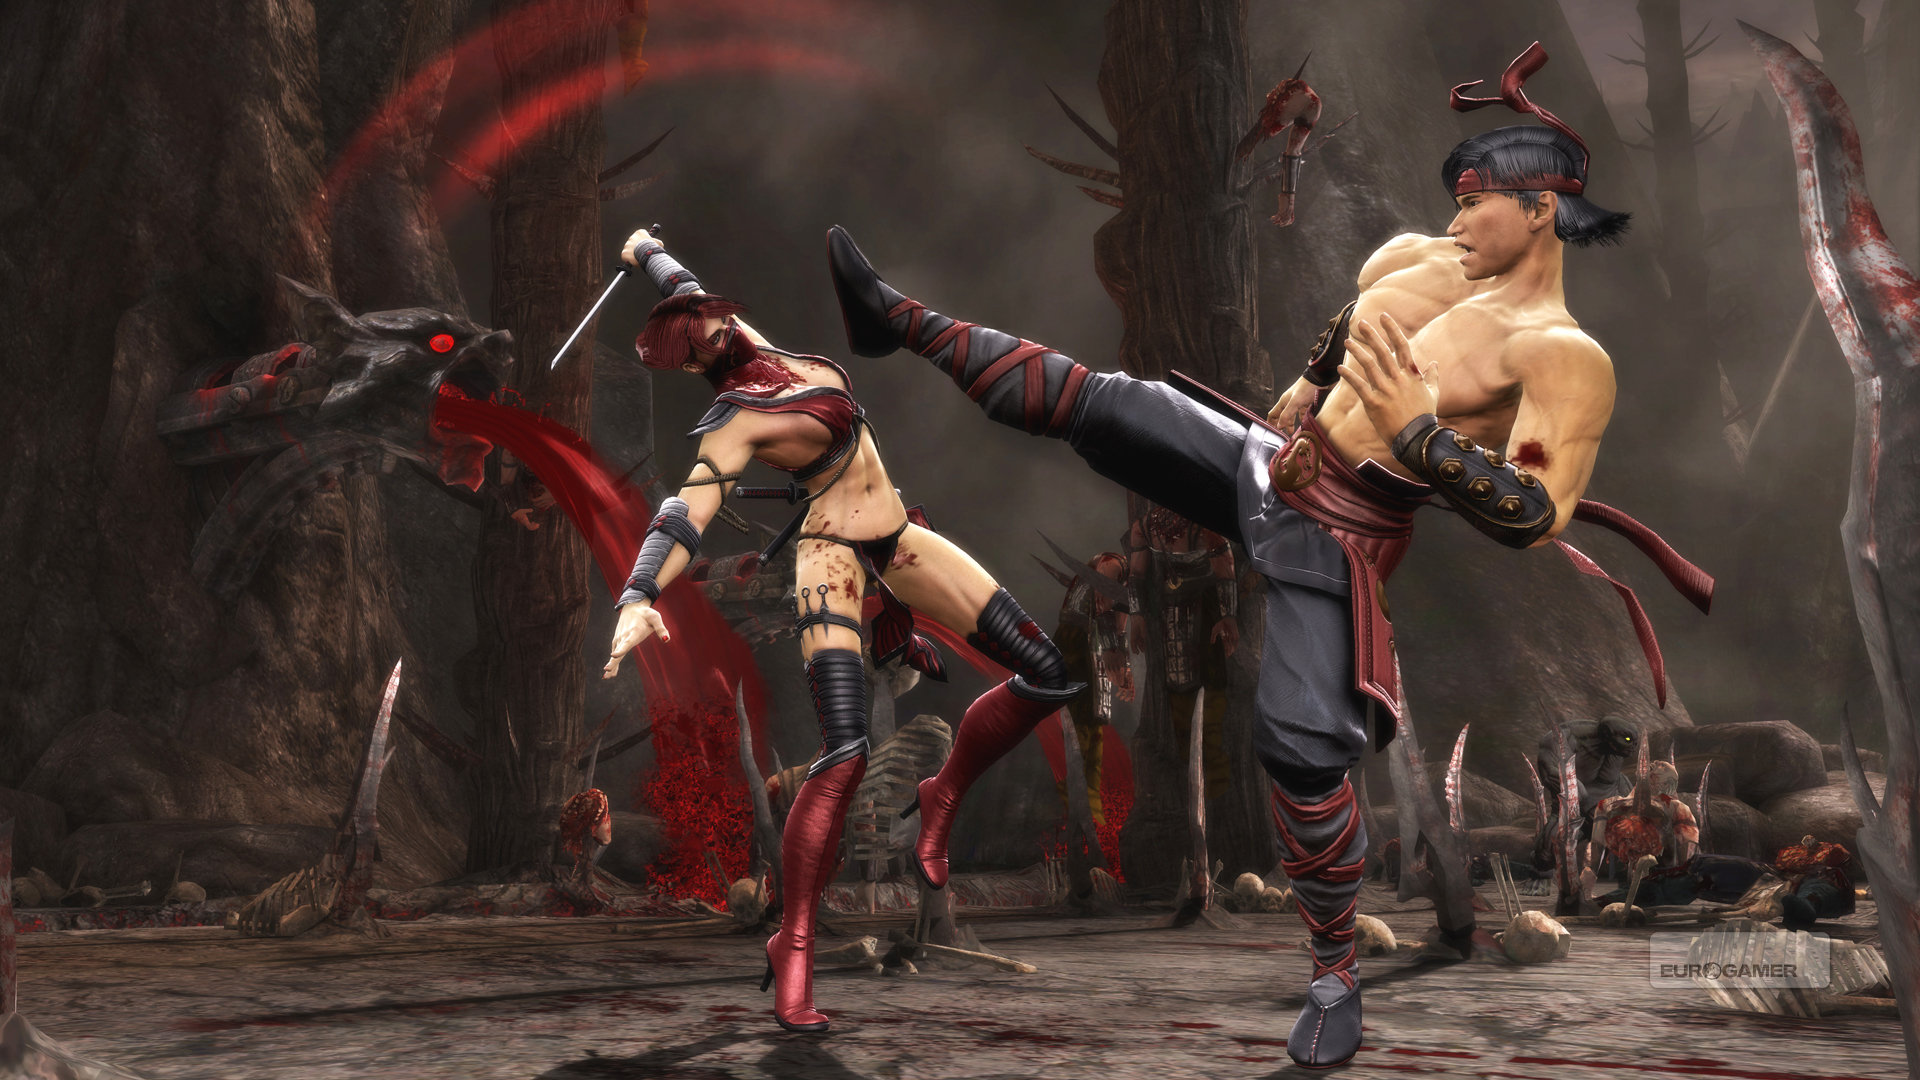 Mortal Kombat X Wallpaper Liu Kang